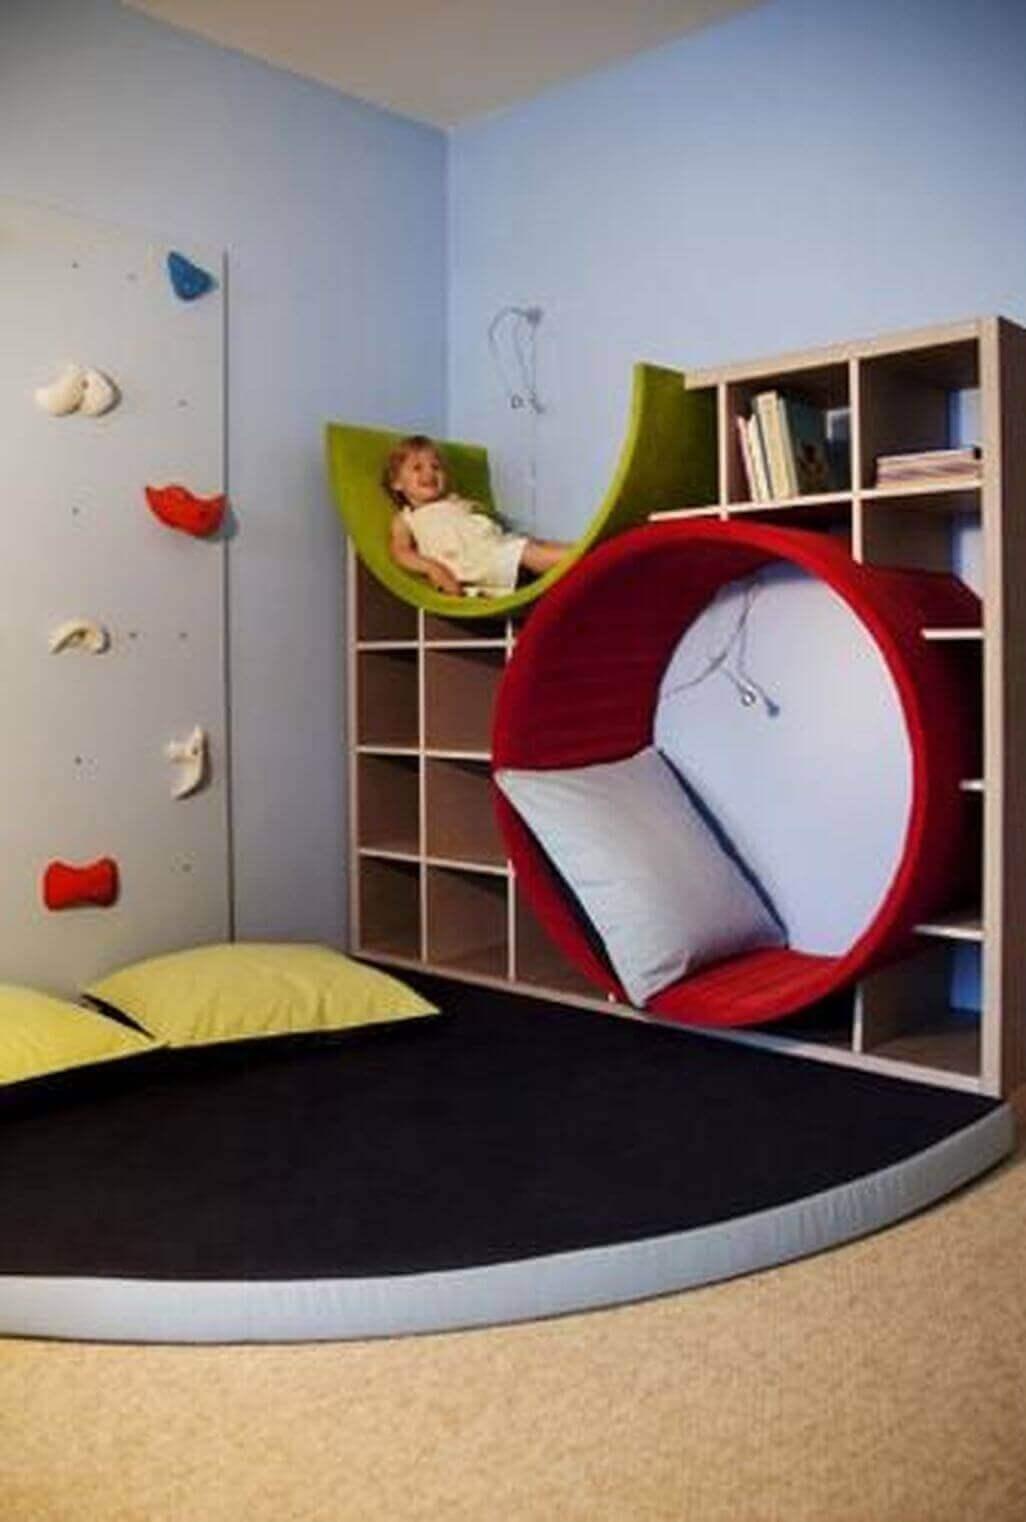 Kids Bedroom Ideas Unusual Dreamscape - Harptimes.com